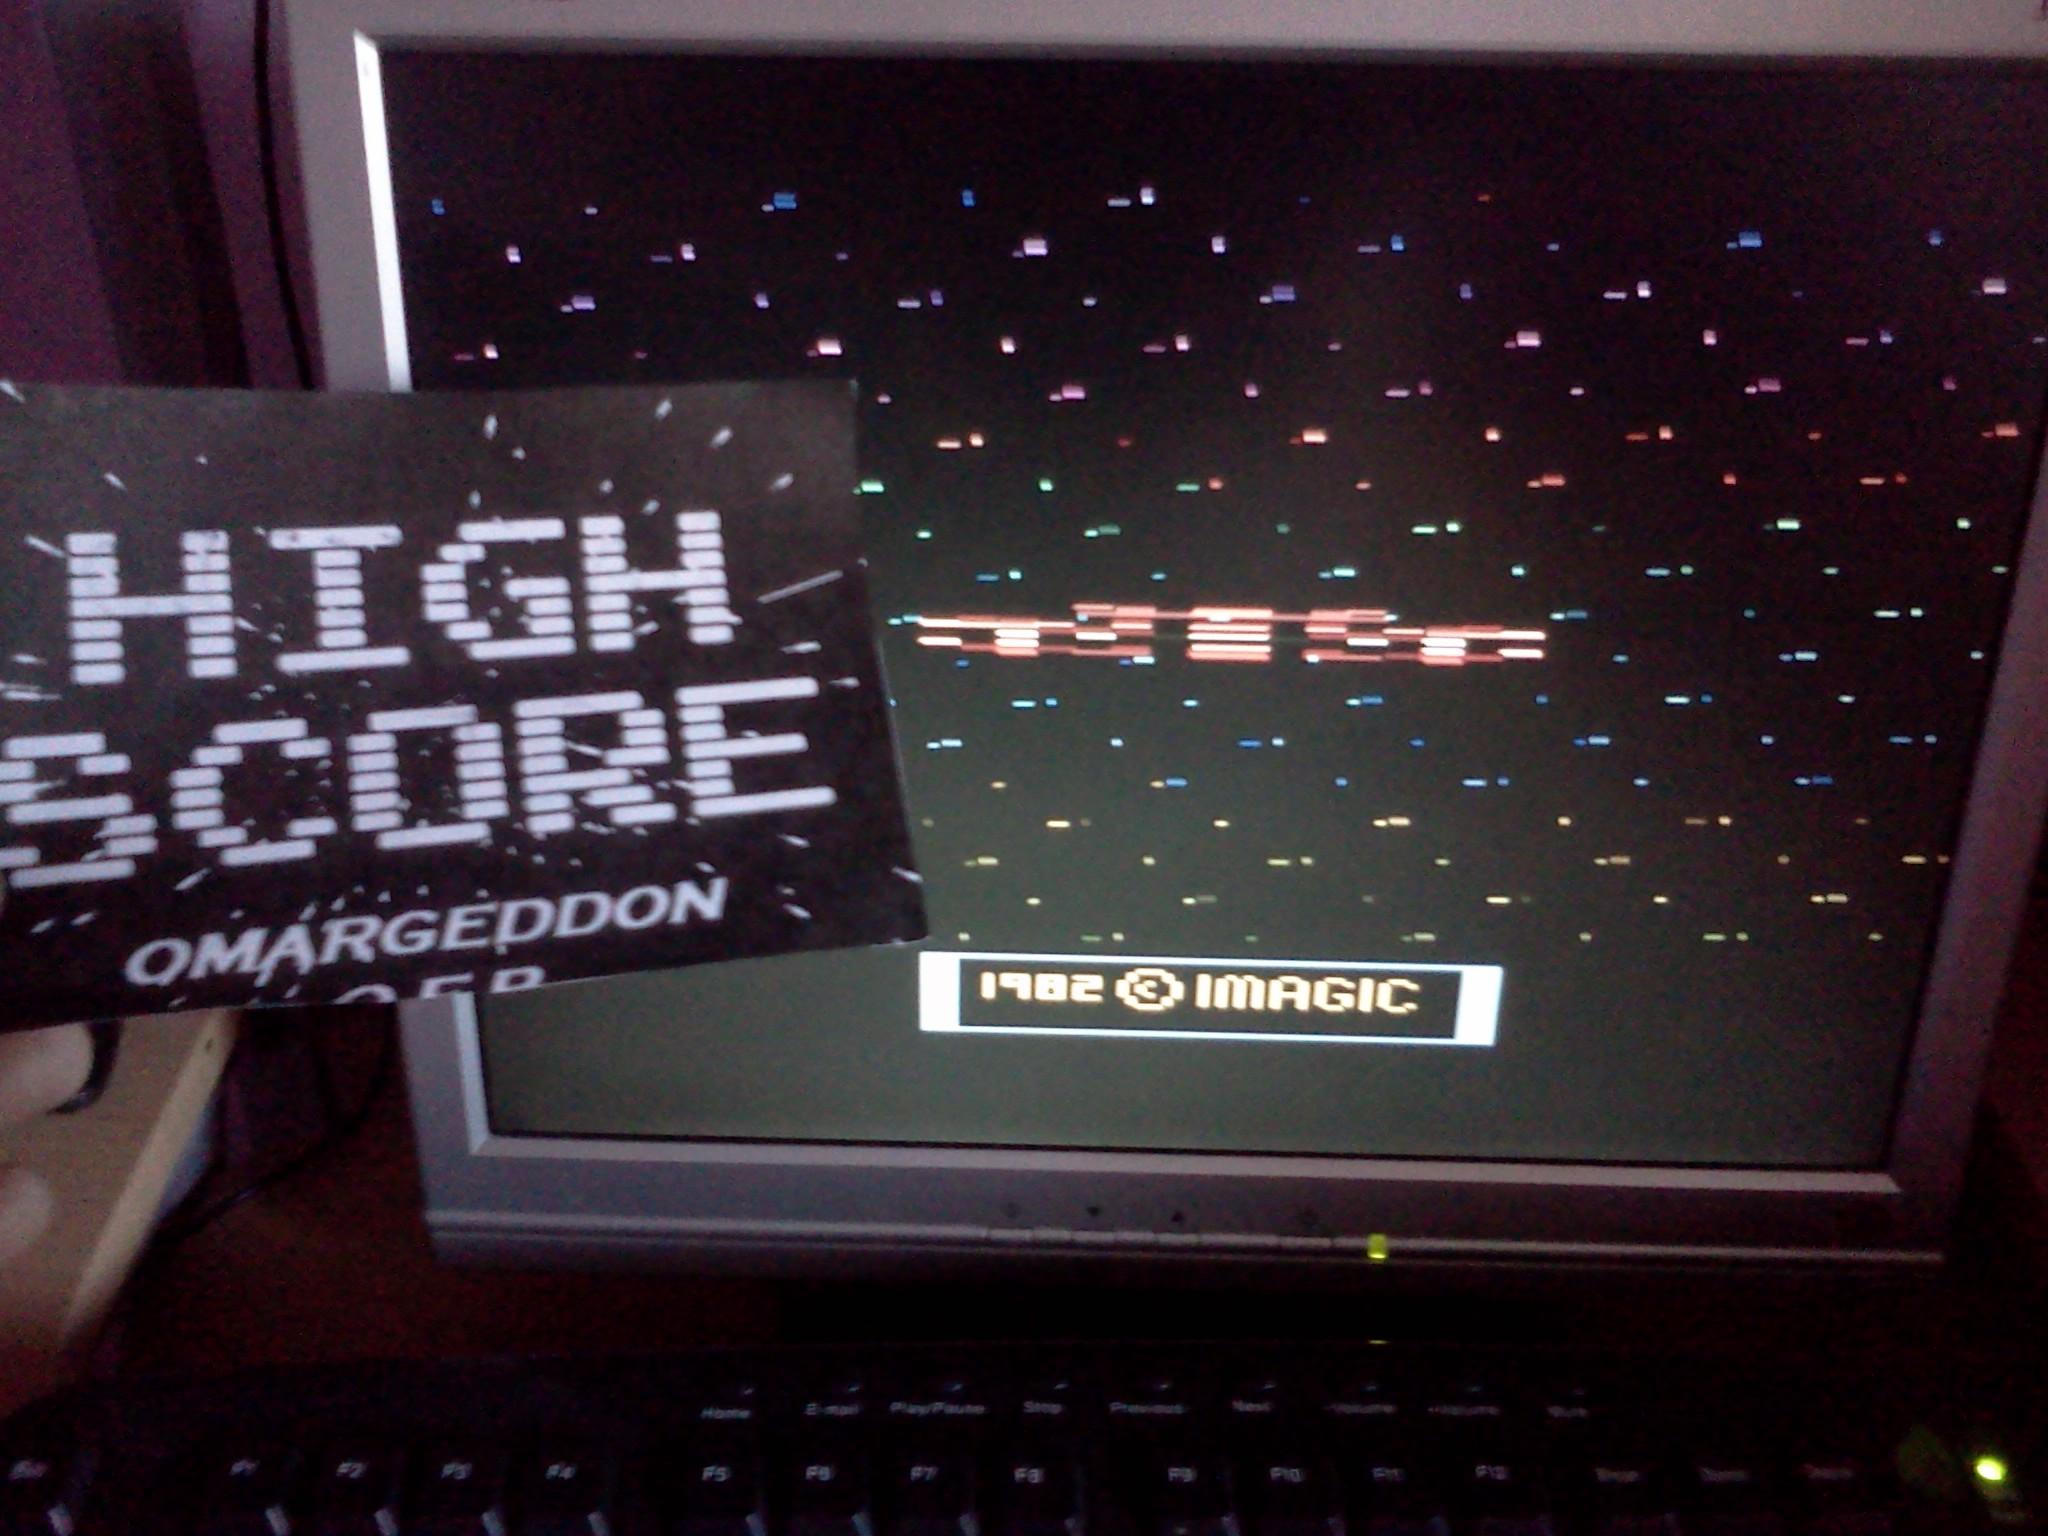 omargeddon: Cosmic Ark (Atari 2600 Emulated Novice/B Mode) 10,810 points on 2016-08-09 11:30:01